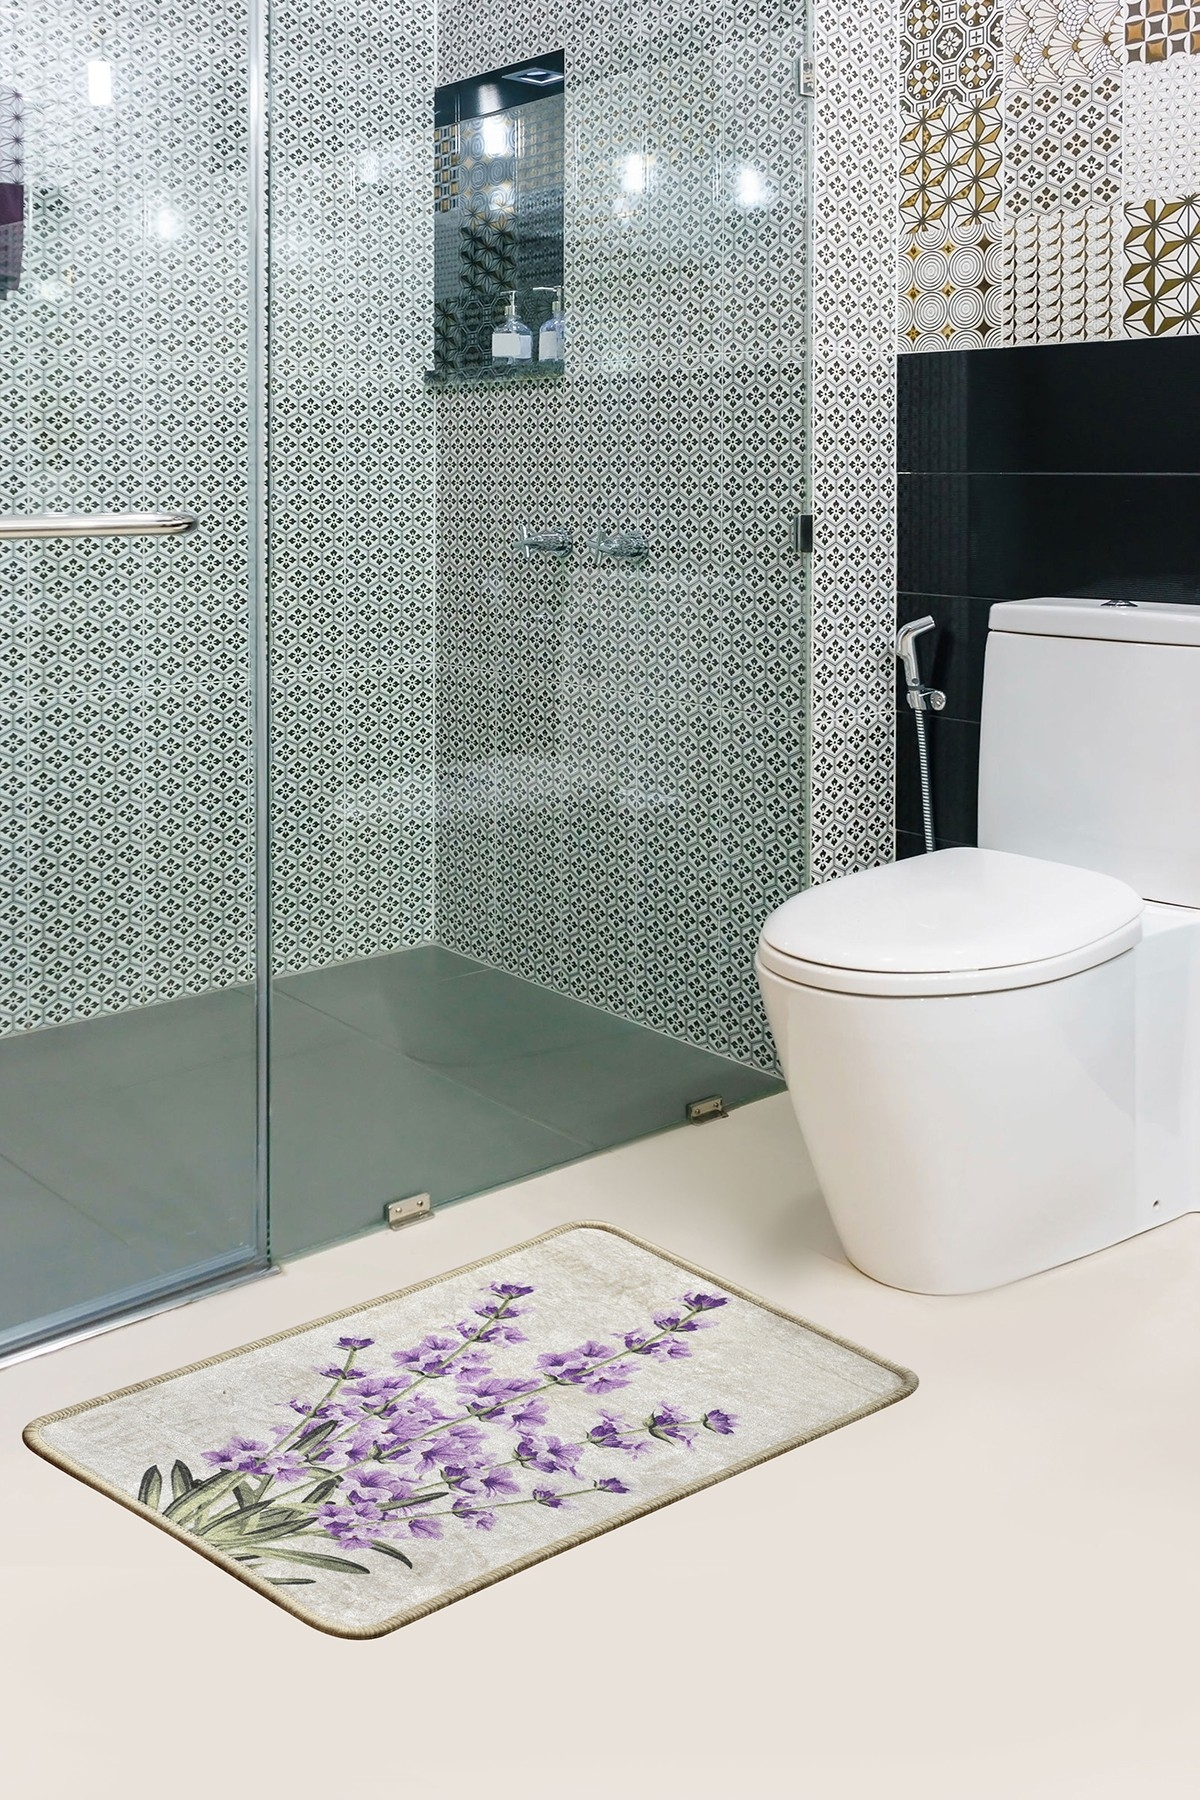 Covoras pentru baie Lavender Multicolor, 40 x 60 cm poza